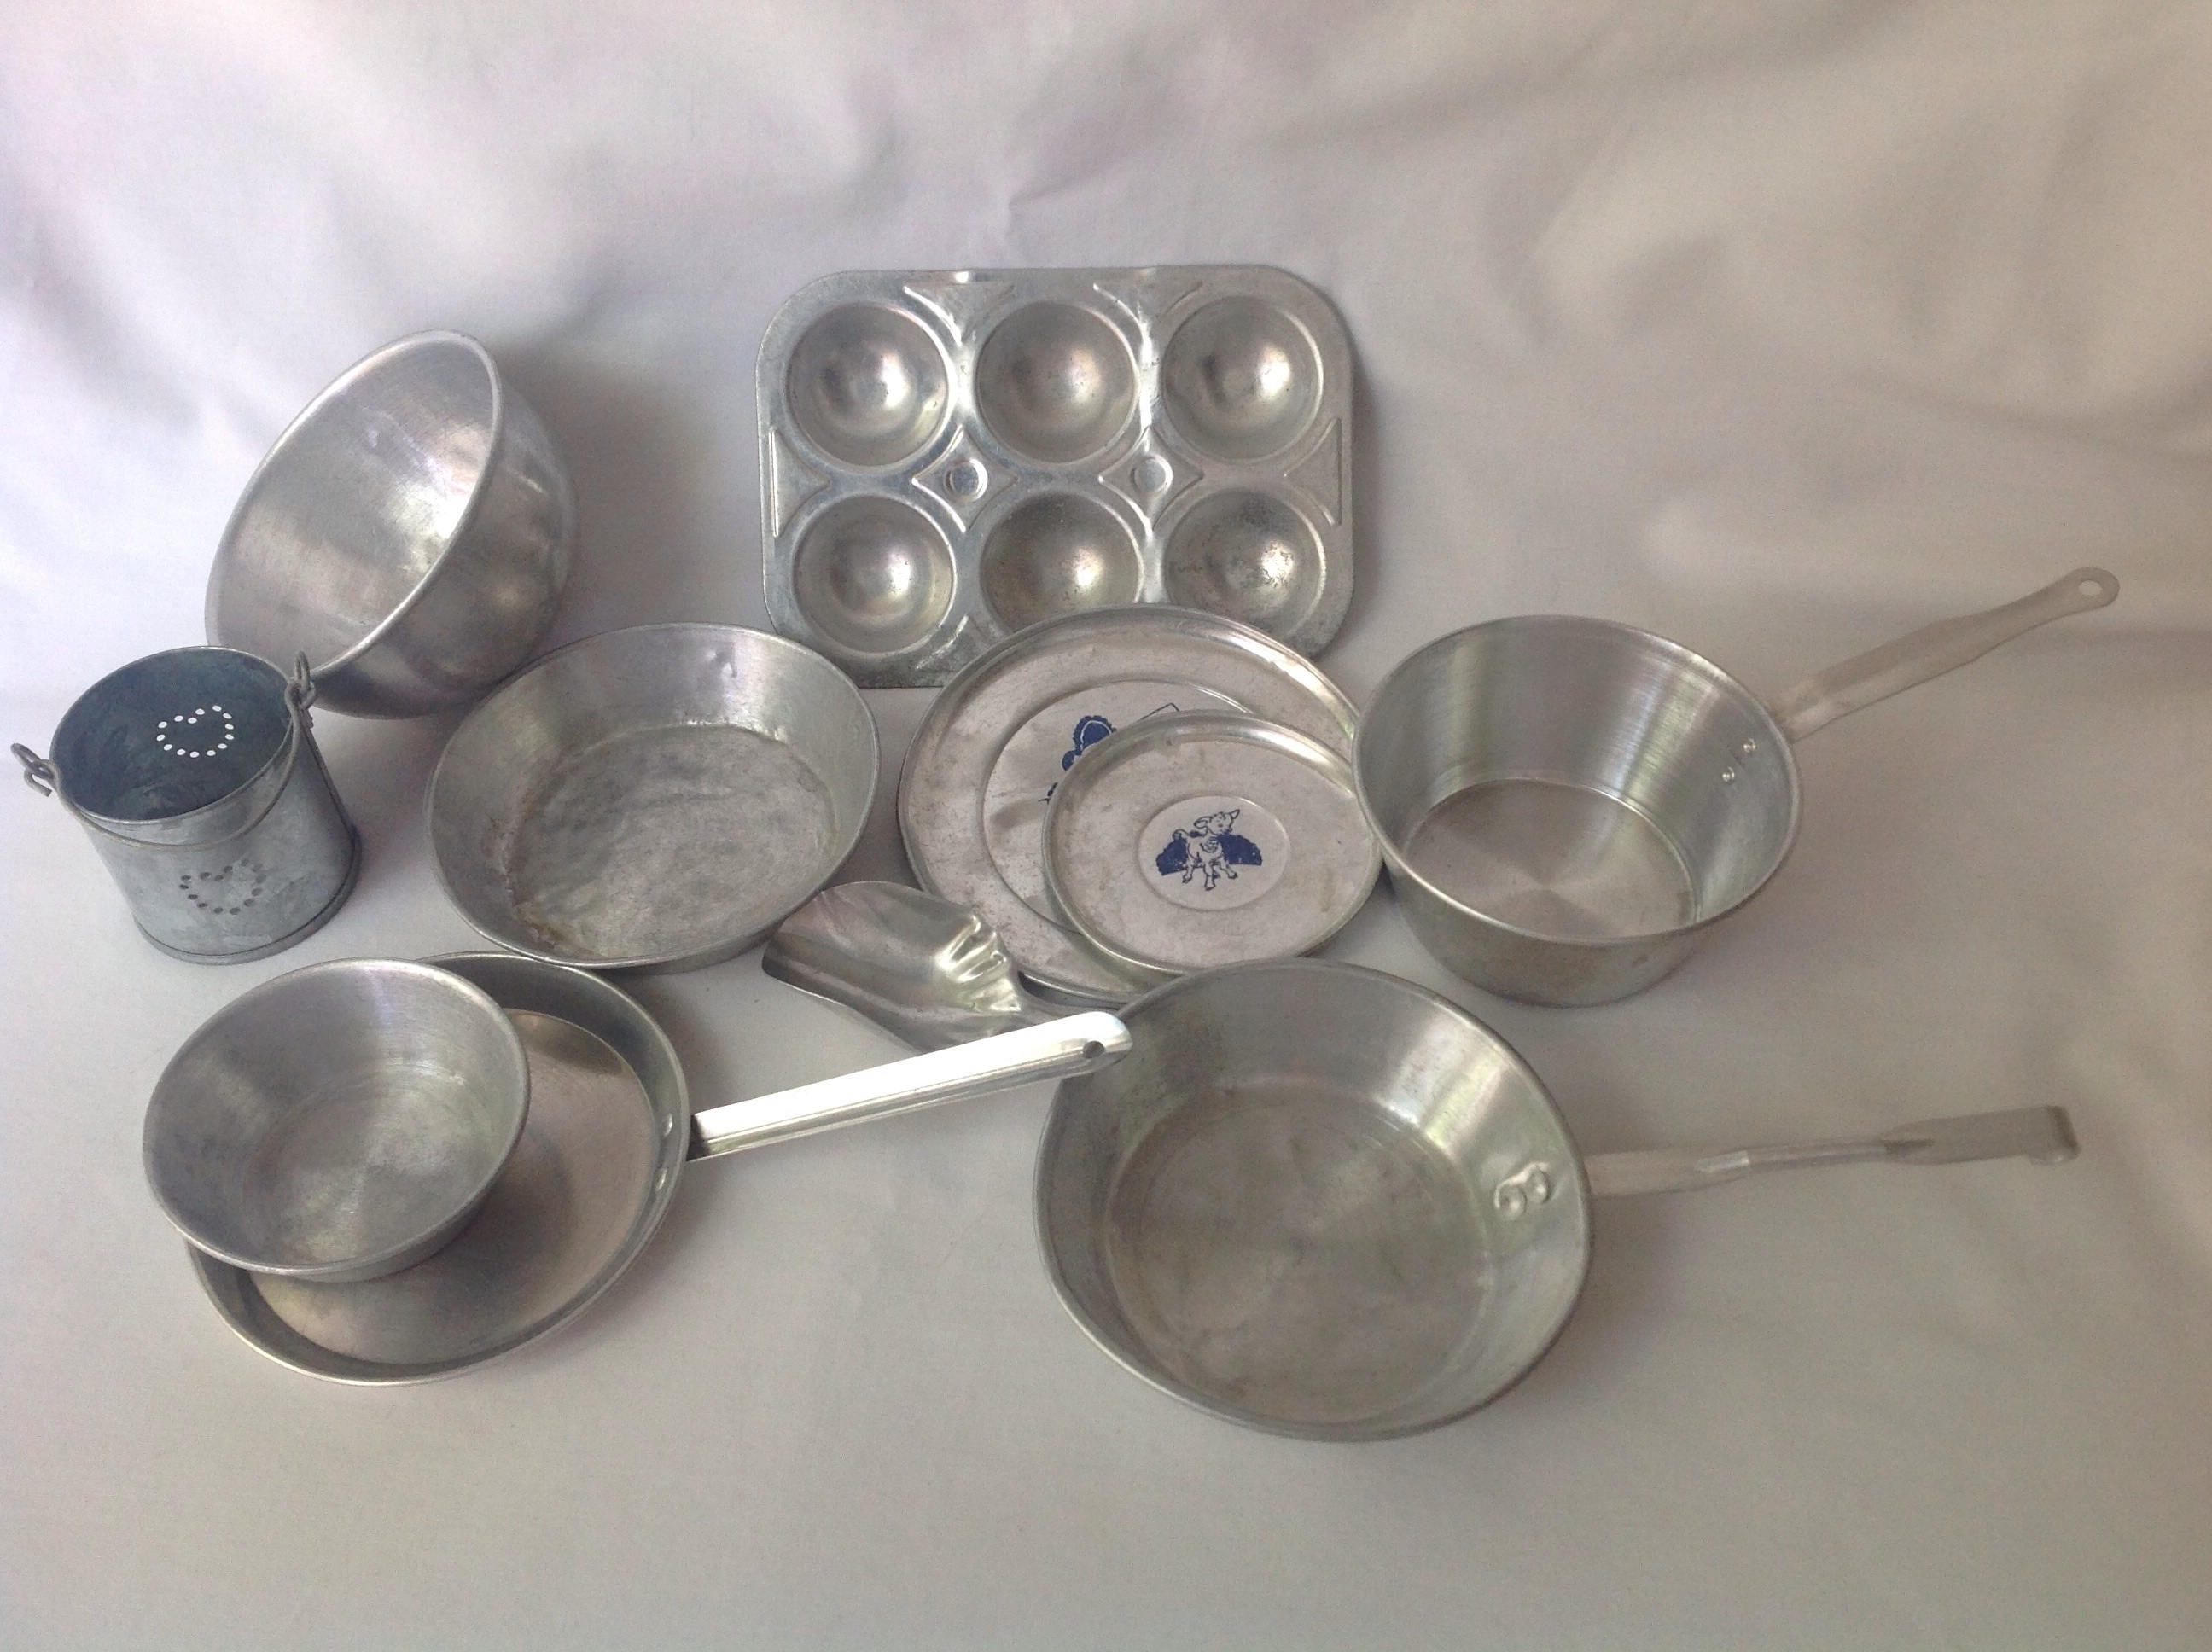 Toy Pots And Pans : Childrens vintage aluminum pots and pans toy